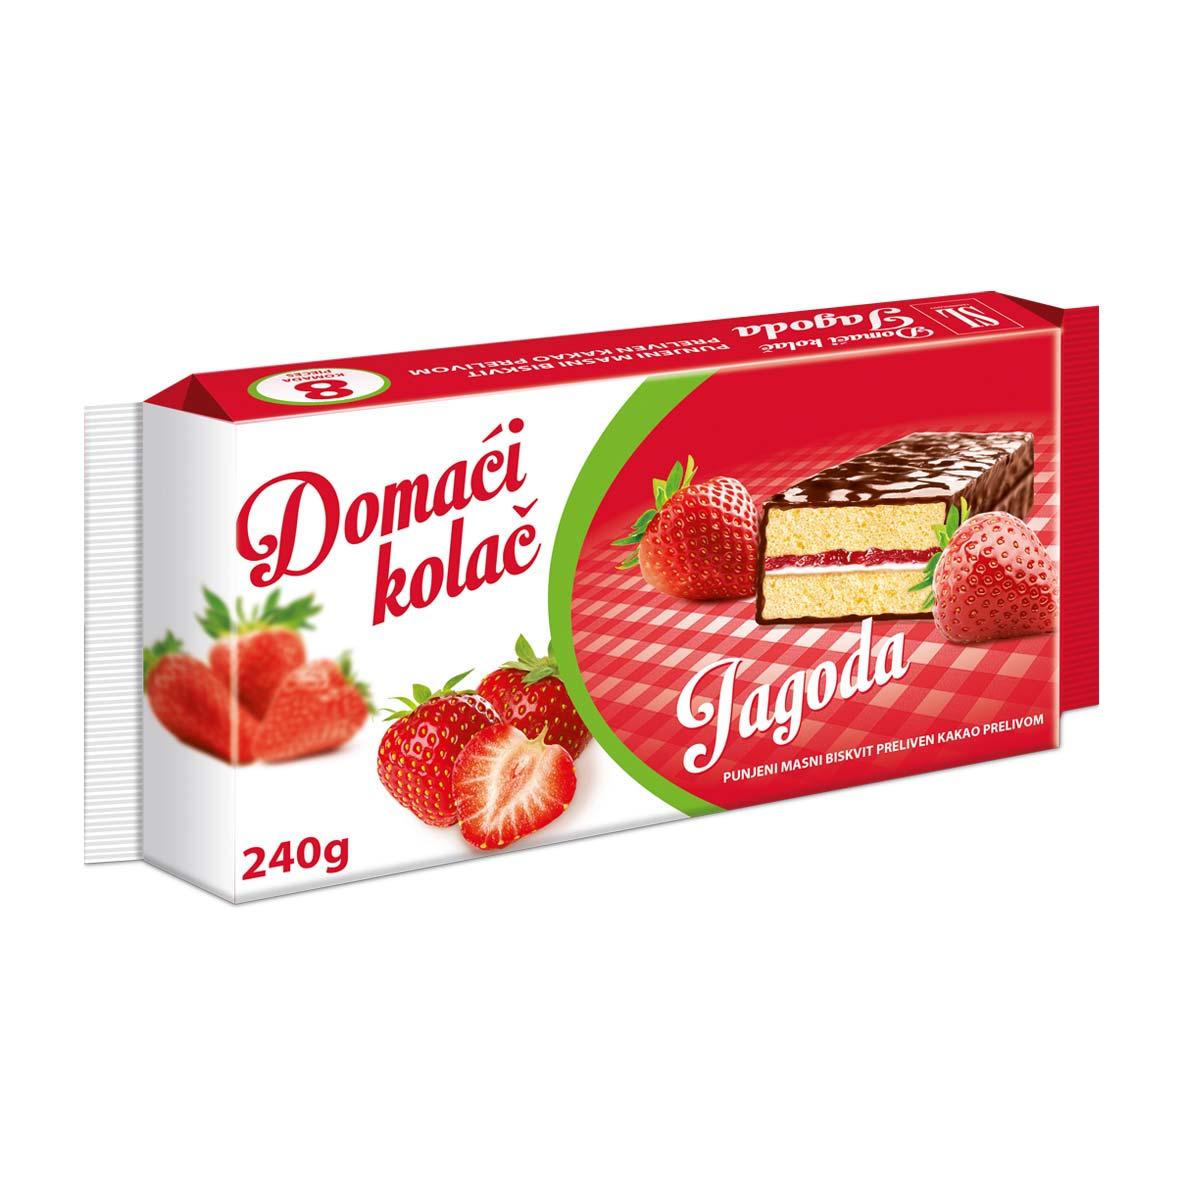 Domaci-KOlac-Jagoda-240g